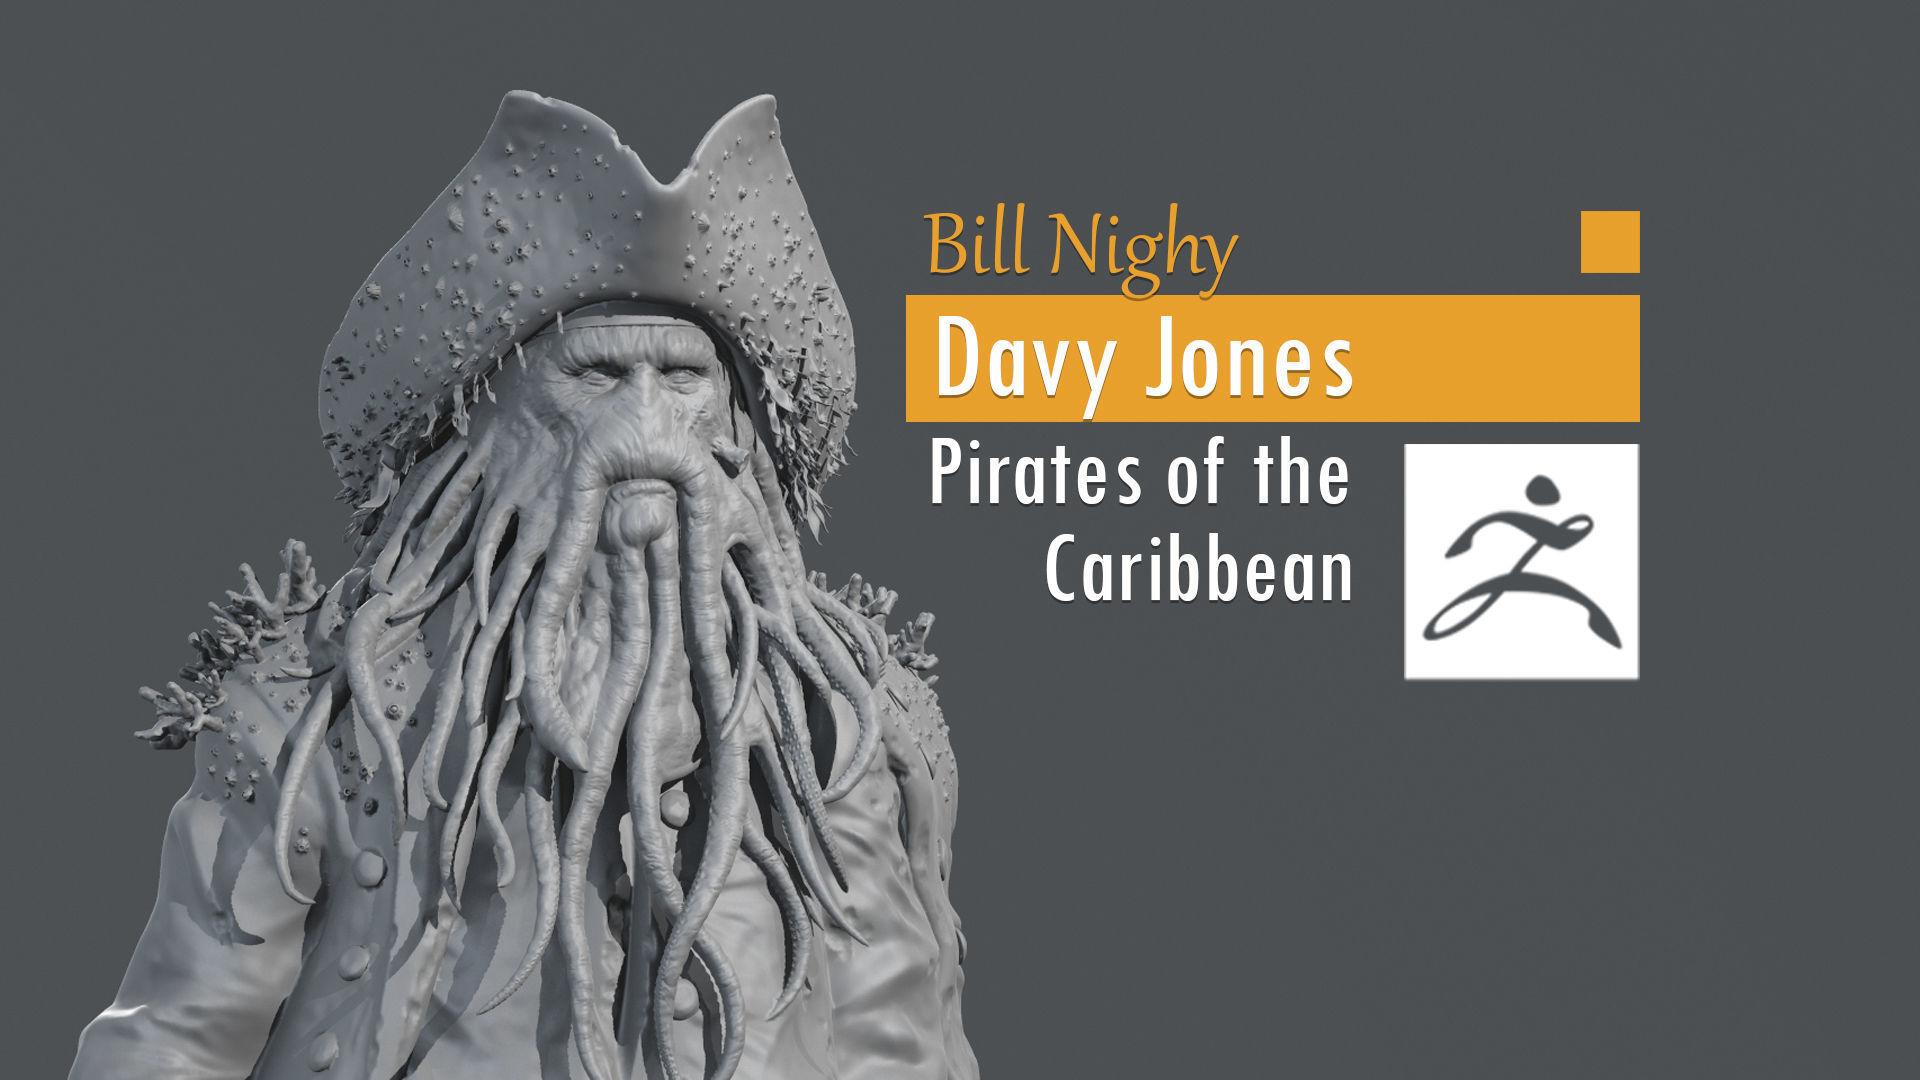 Bill Nighy - Davy Jones - Pirates of the Caribbean